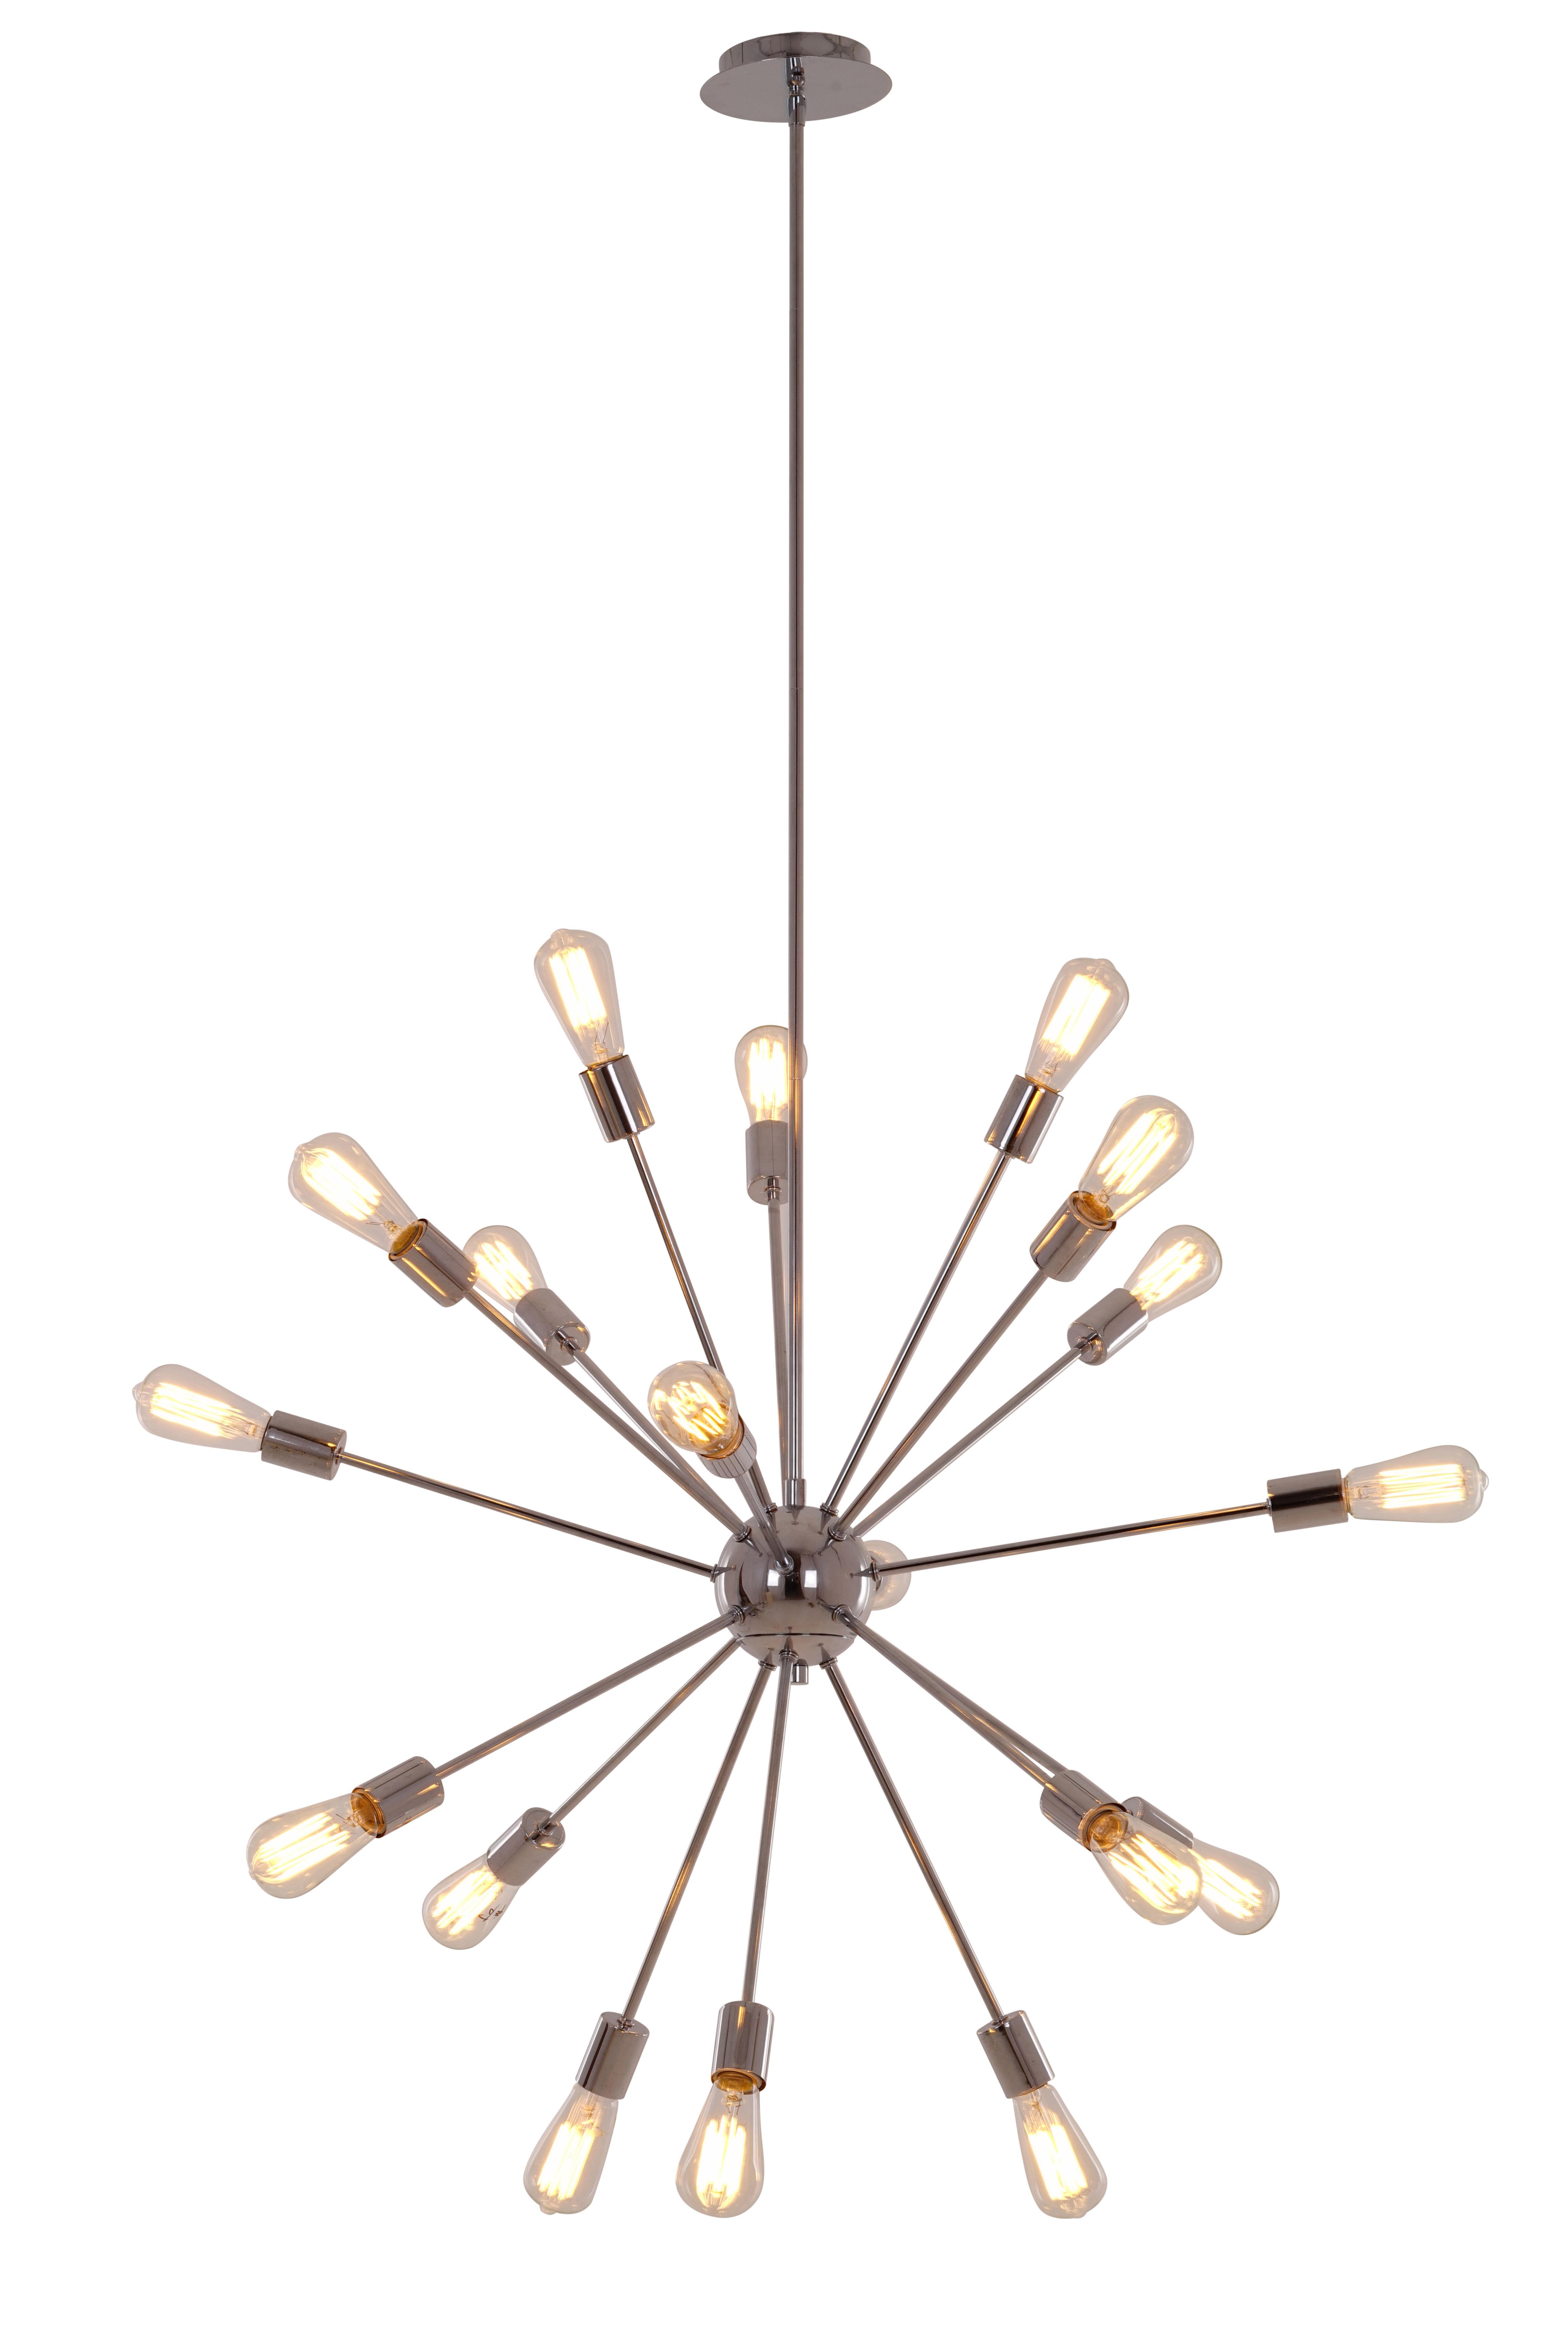 Bach 18-Light Chandelier with regard to Famous Defreitas 18-Light Sputnik Chandeliers